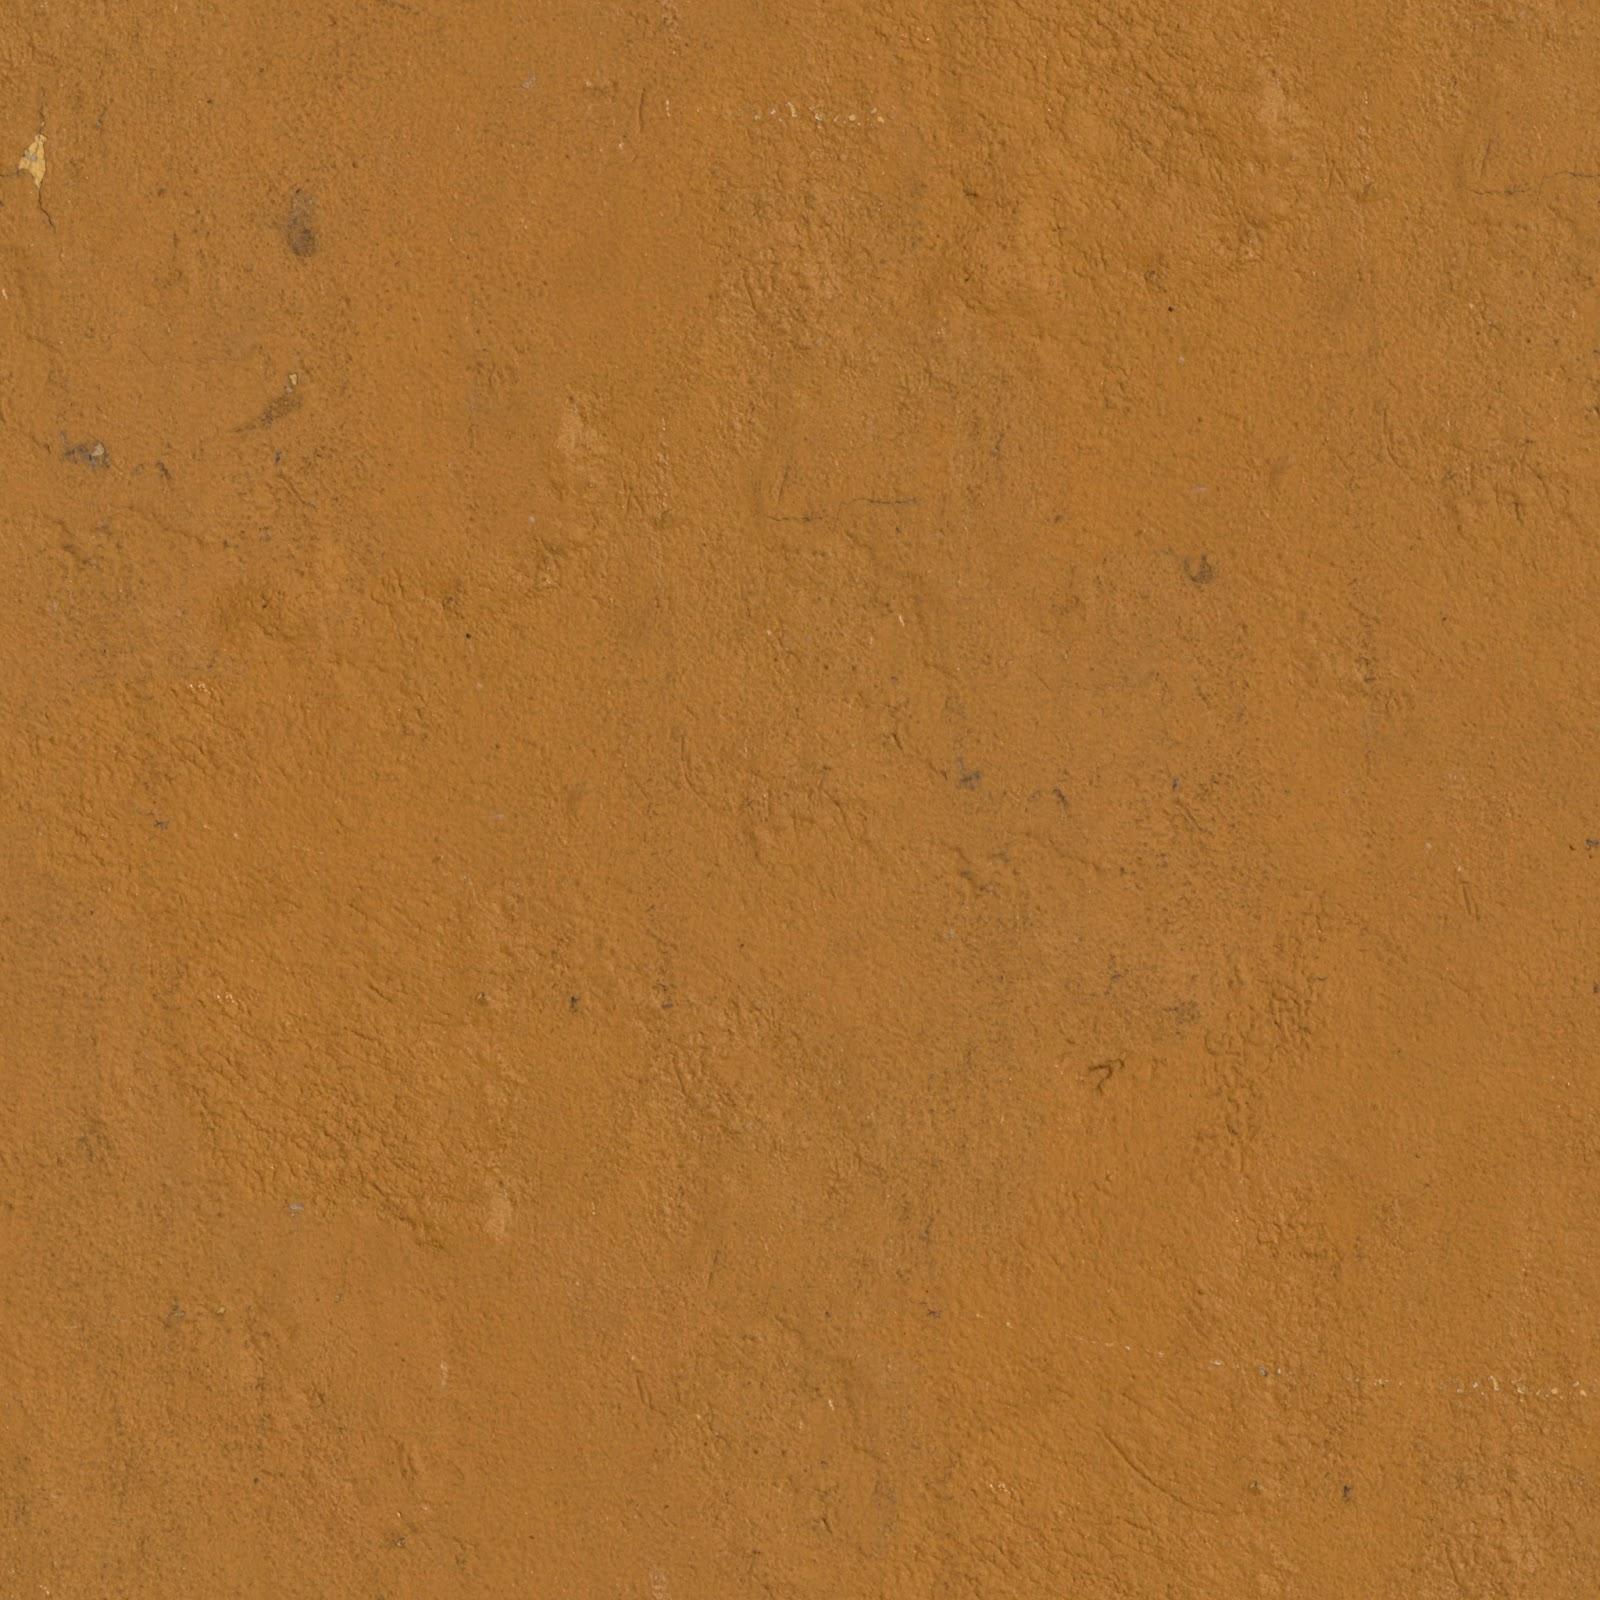 Wall stucco orange dirt seamless texture 2048x2048